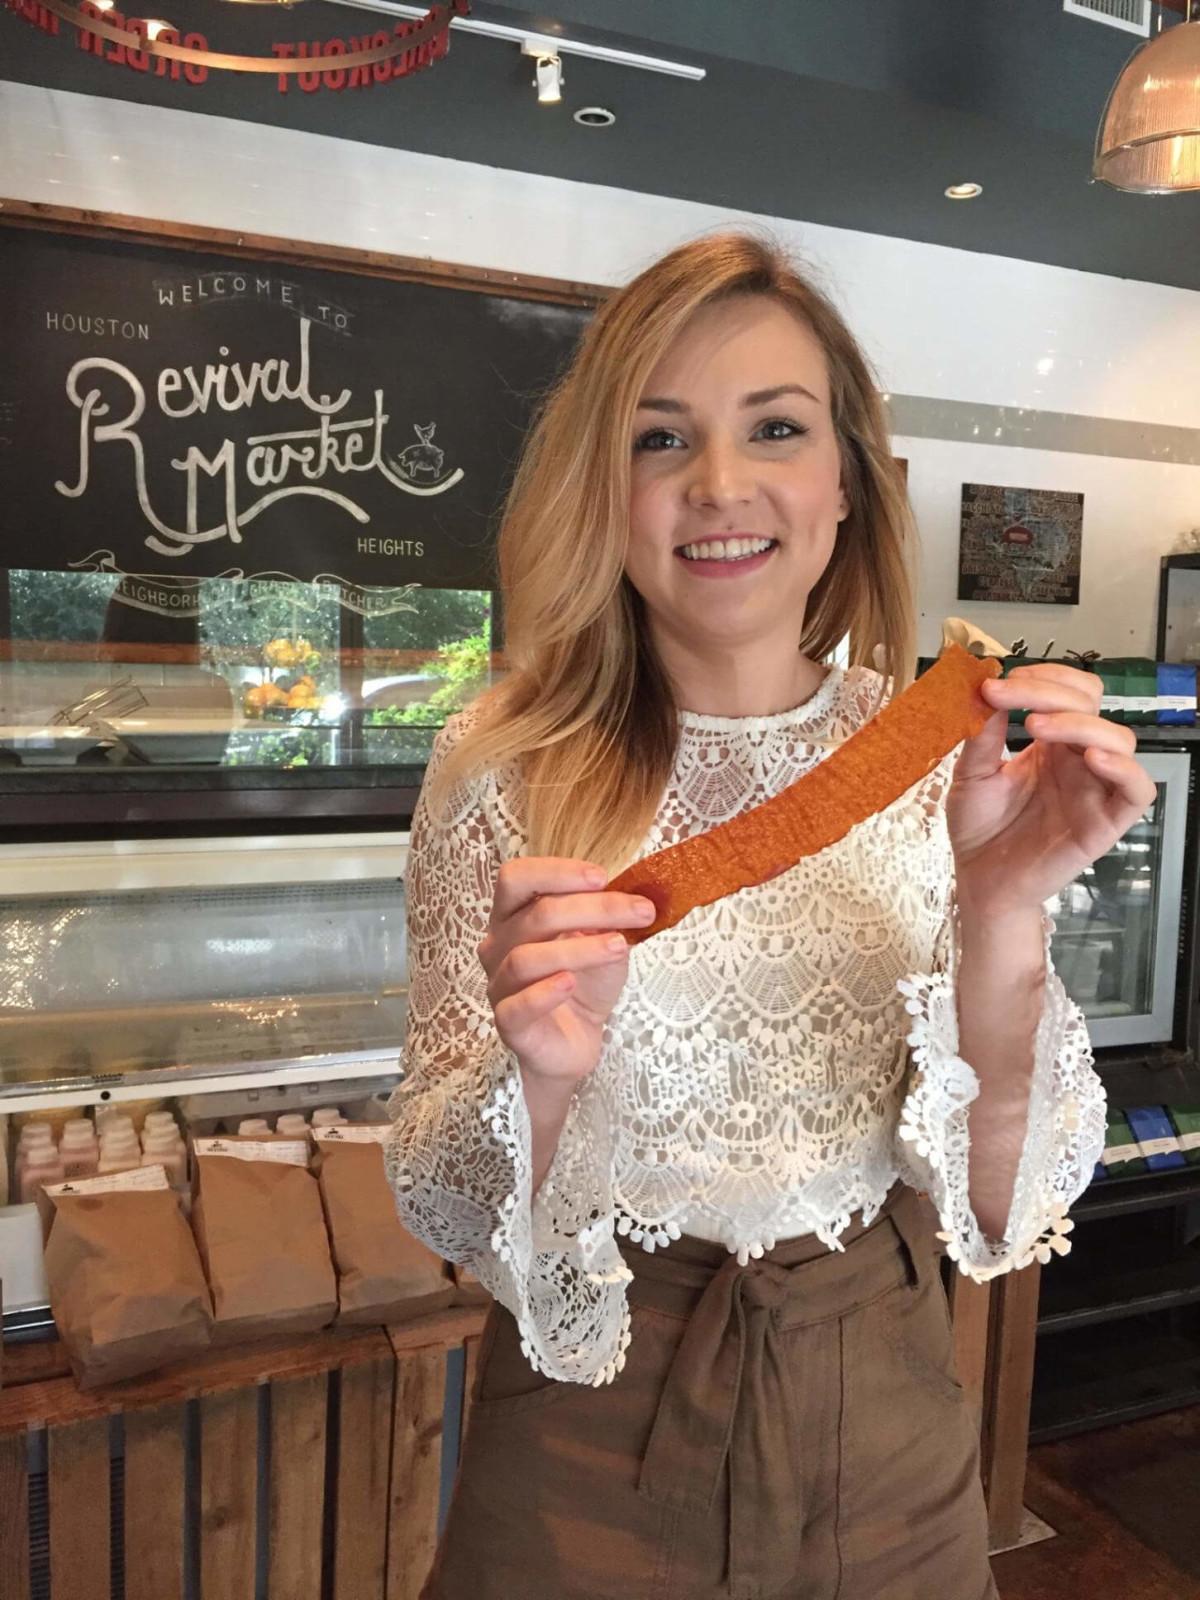 Revival Market baker Valeria Trasatti with Fruit Leather Jacket